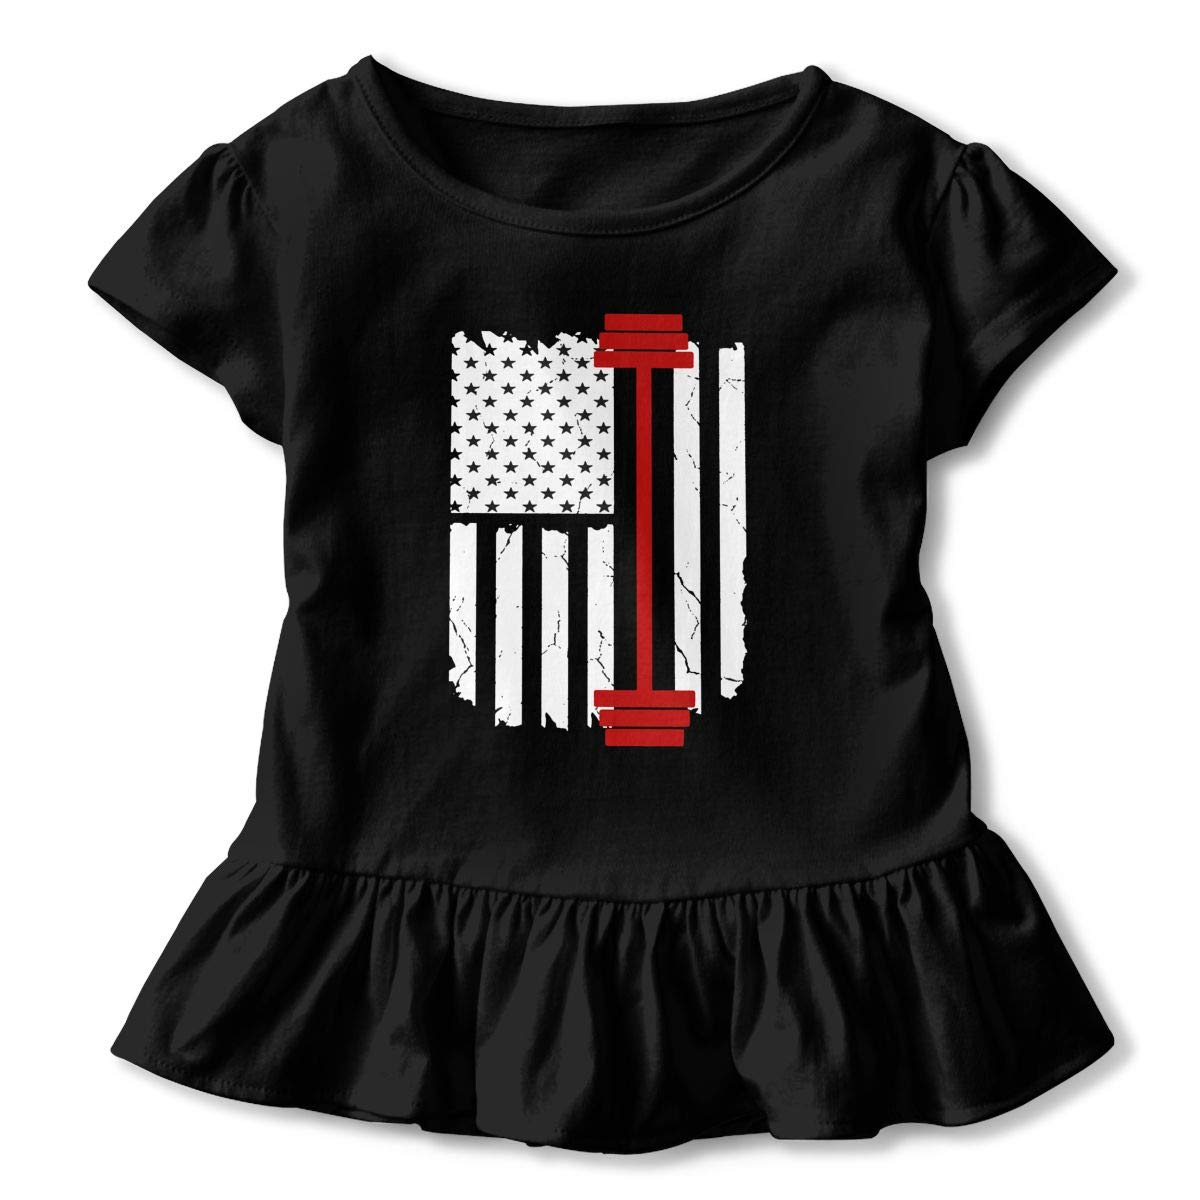 ZP-CCYF American Flag Weight Lifting Toddler Baby Girl Ruffle Short Sleeve T-Shirt Comfortable Cotton T Shirts